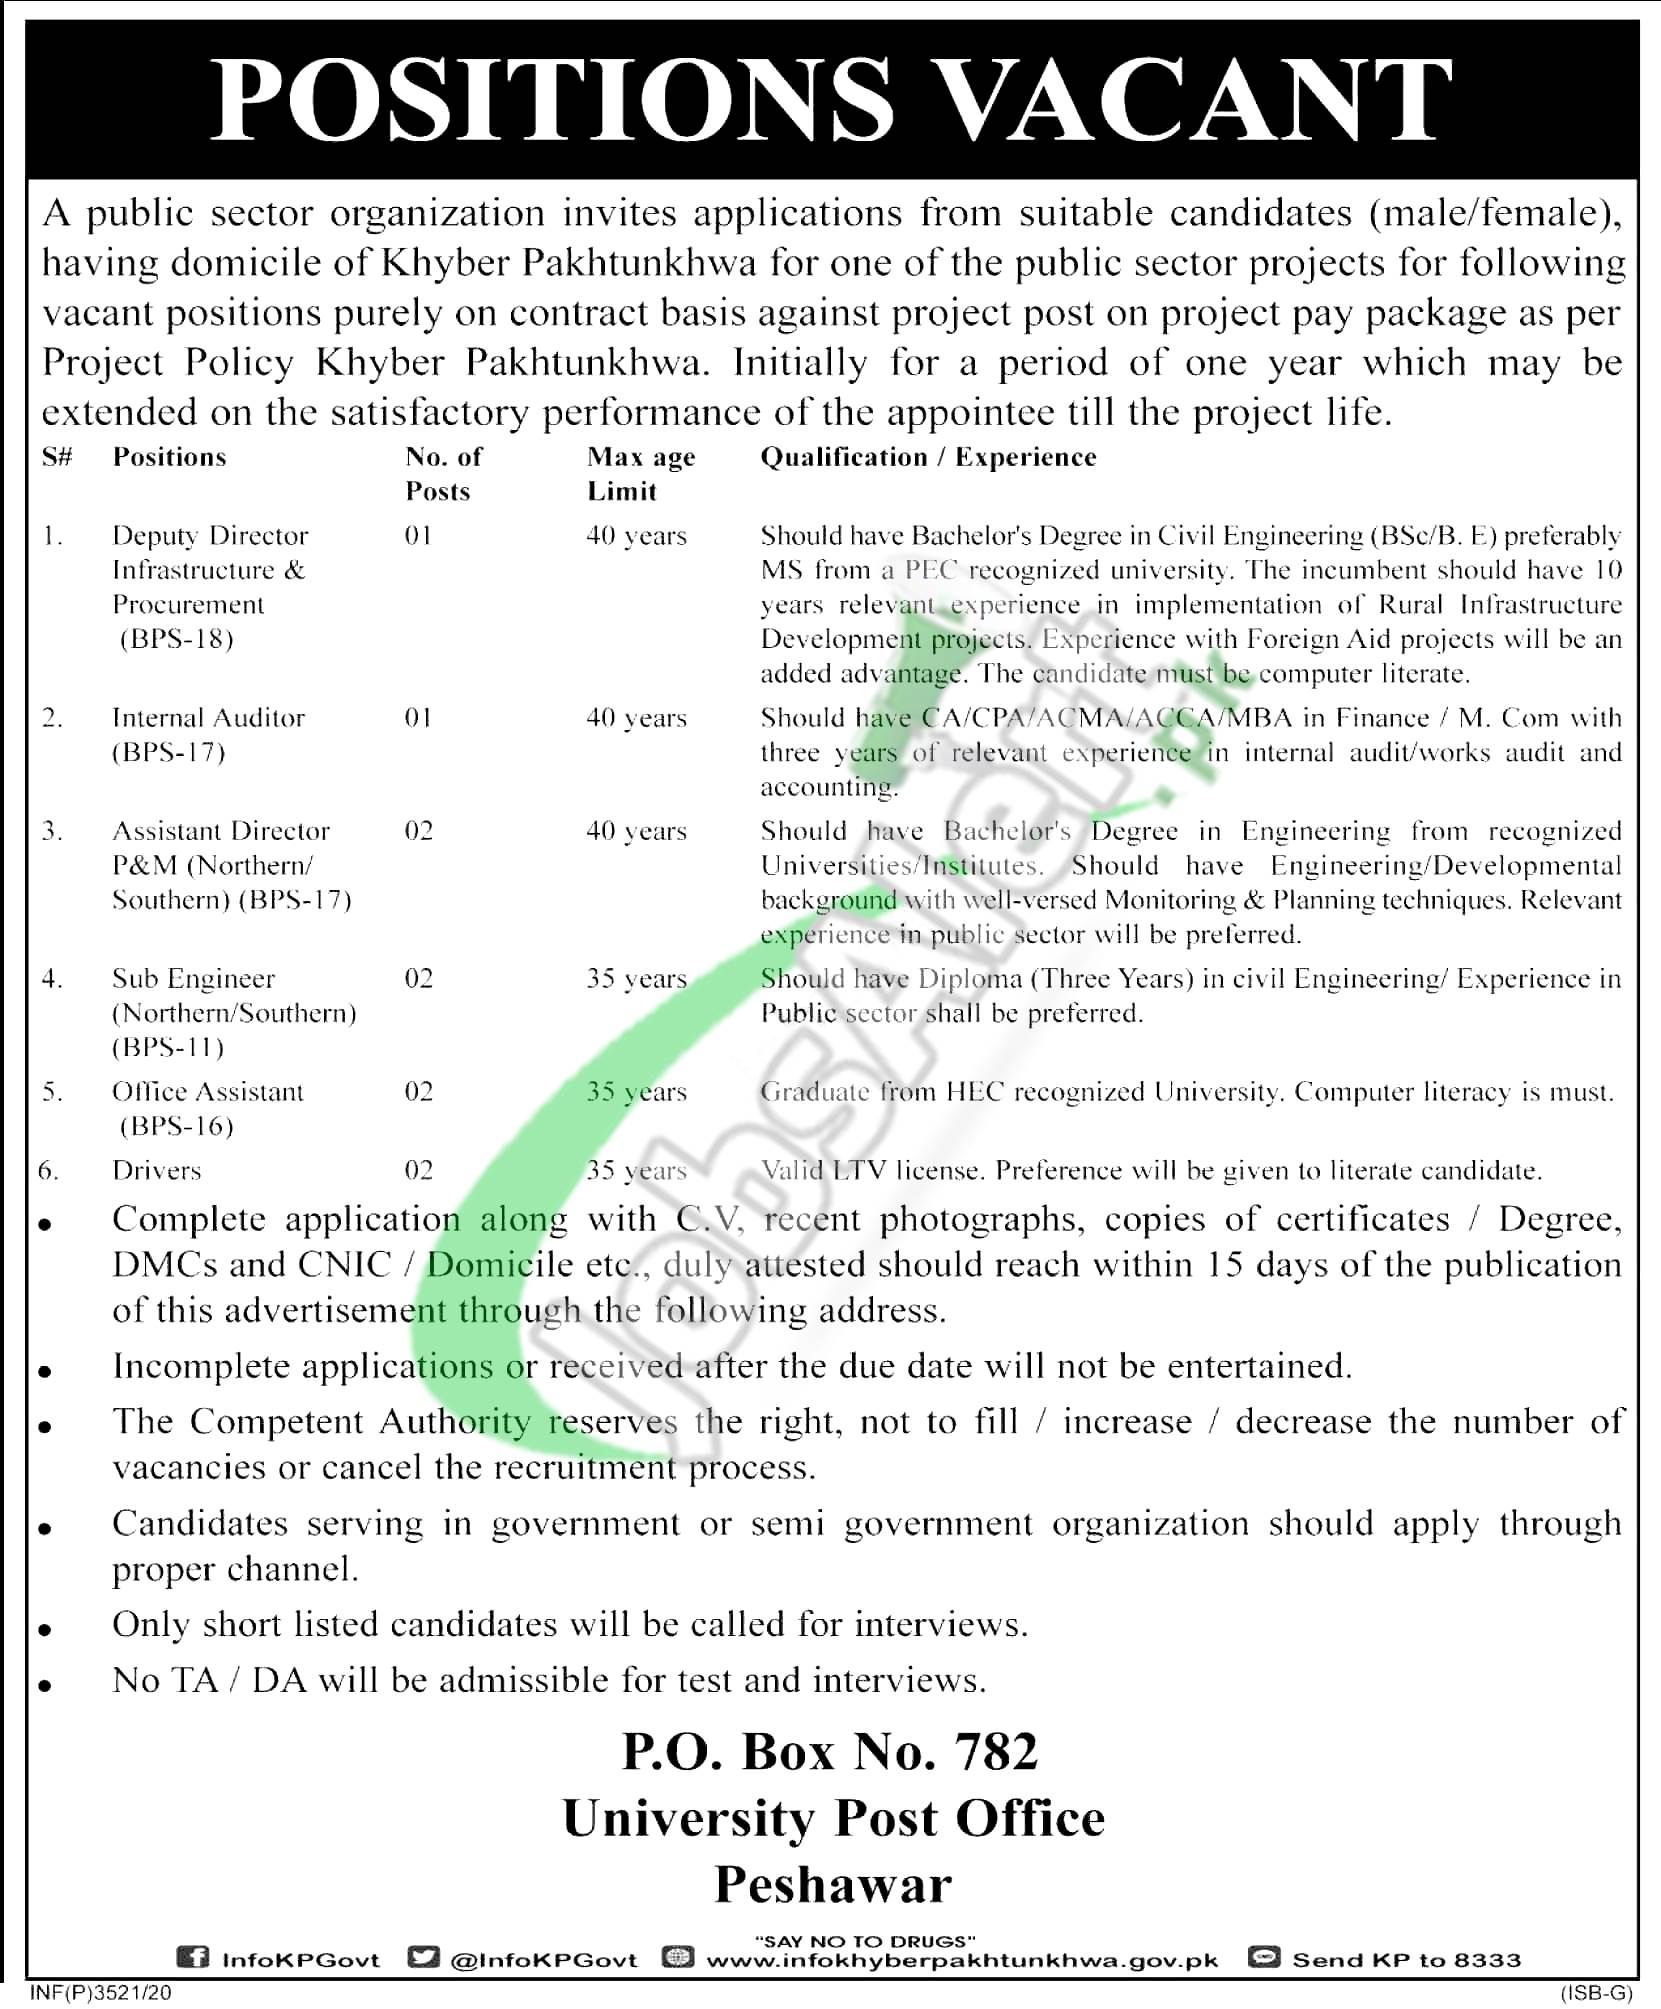 KPK Government Jobs 2020